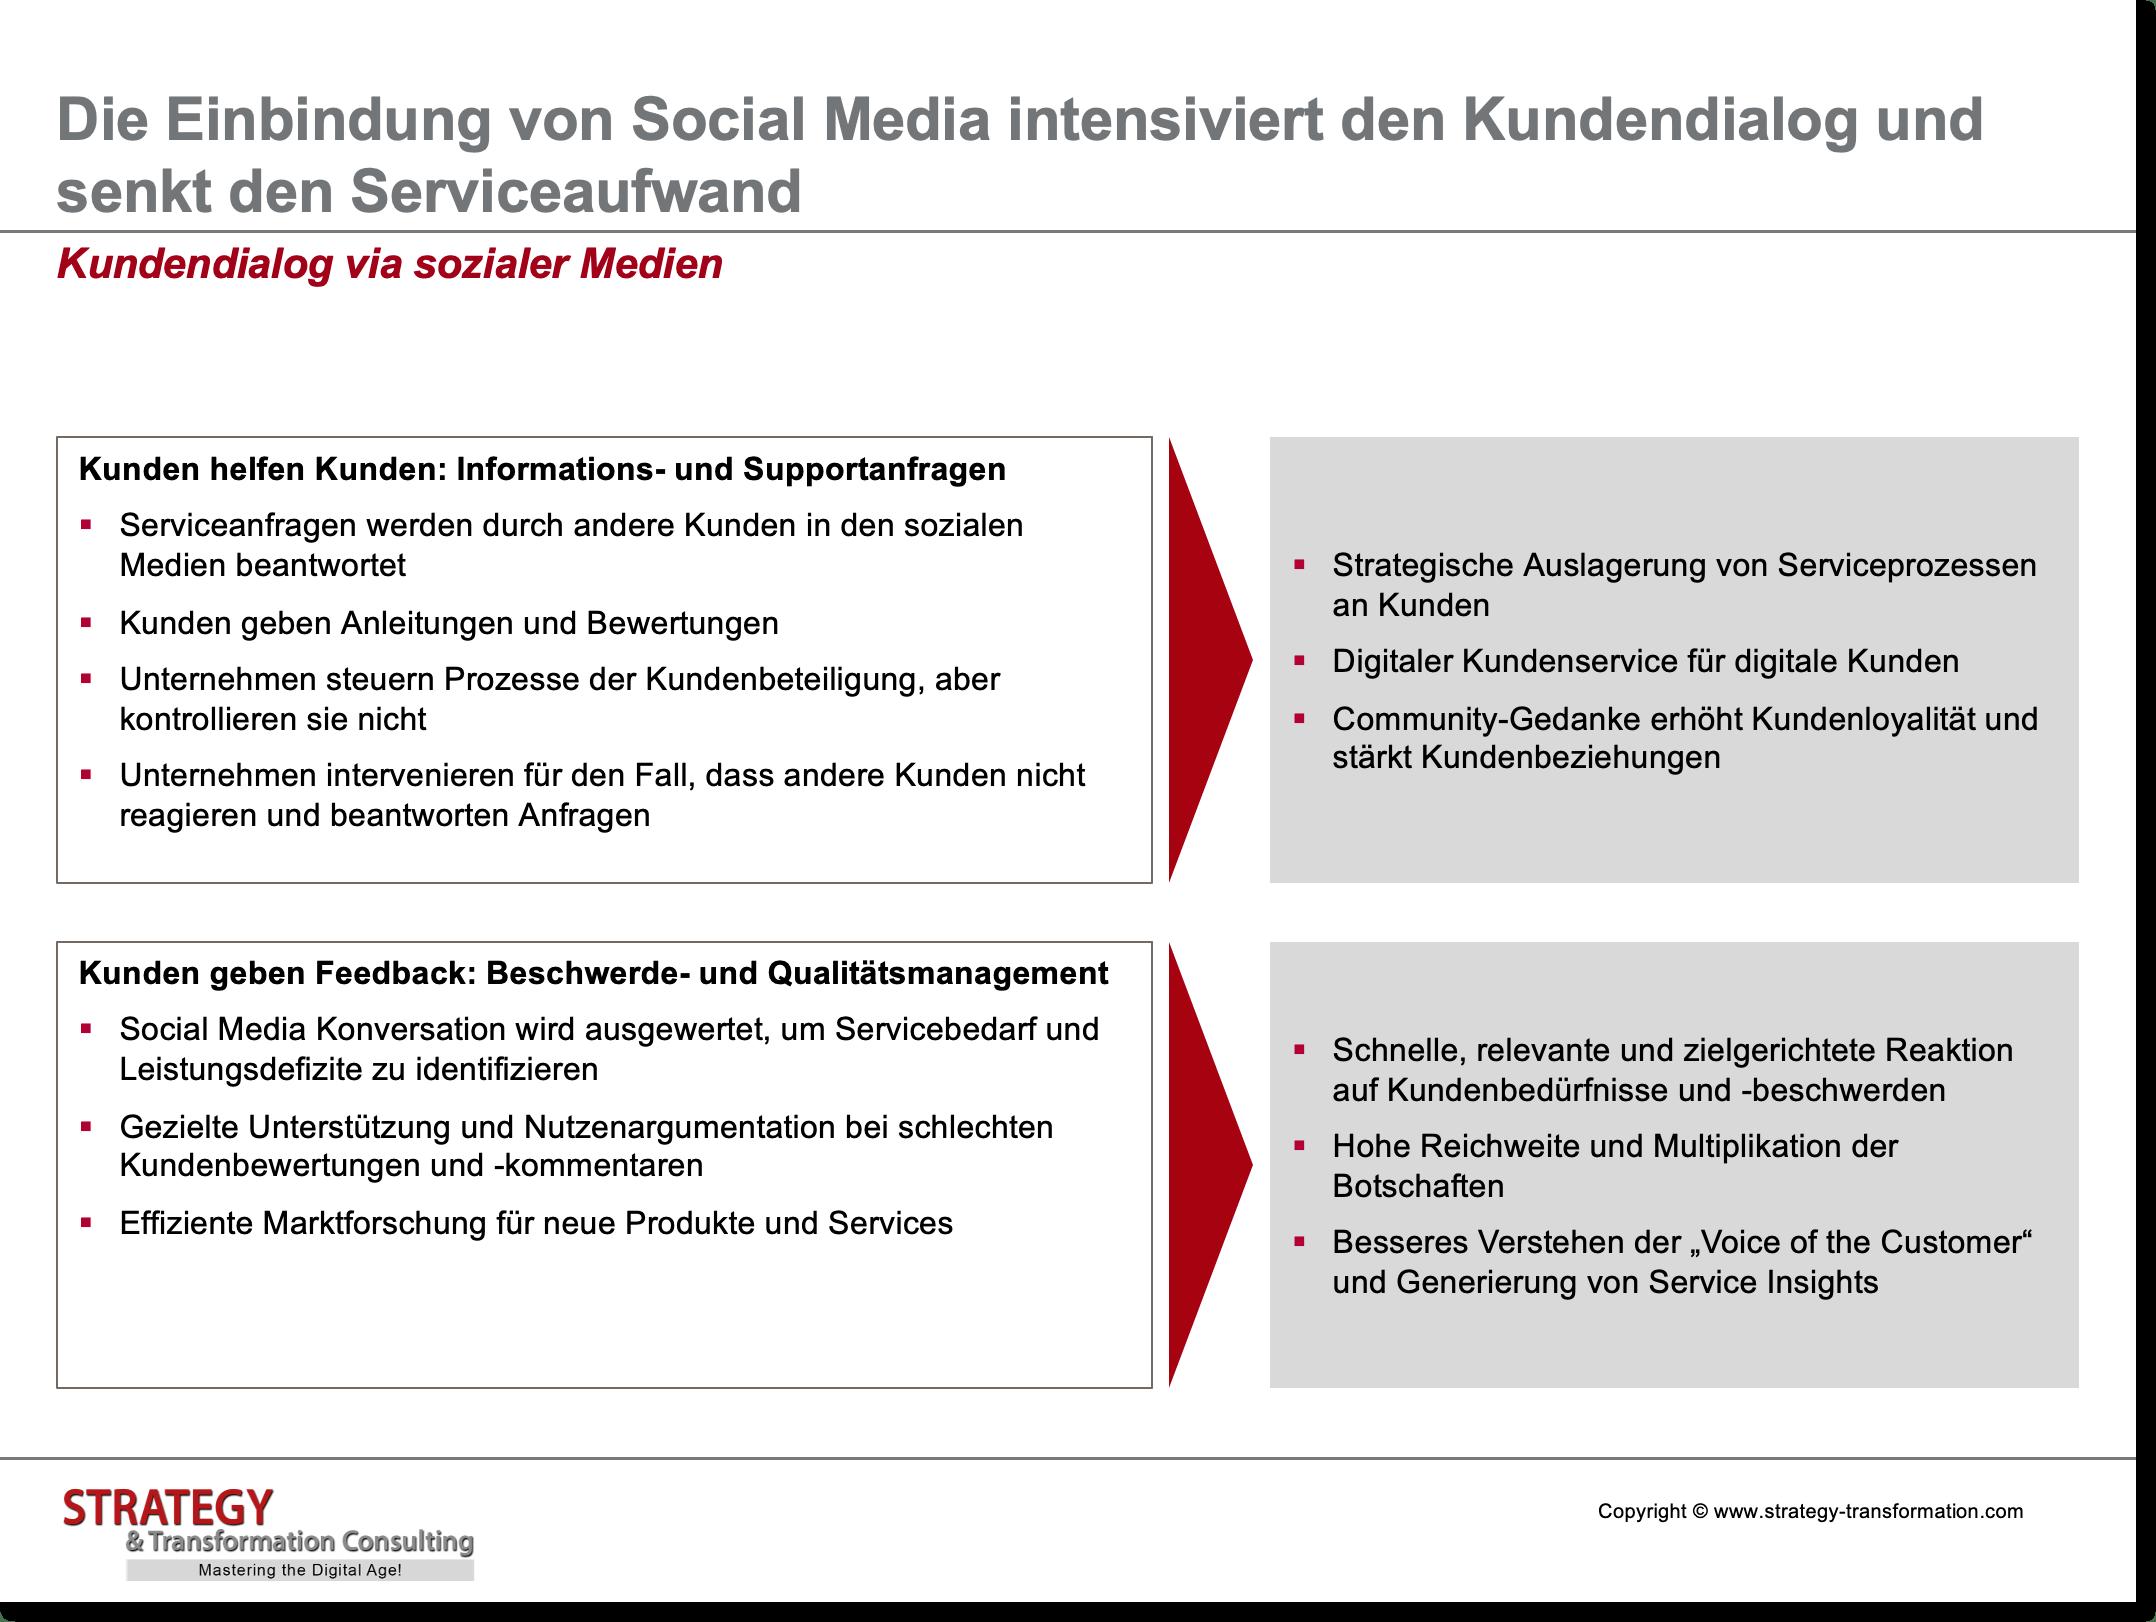 Digitale Transformation verstehen_Kundendialog via sozialer Medien